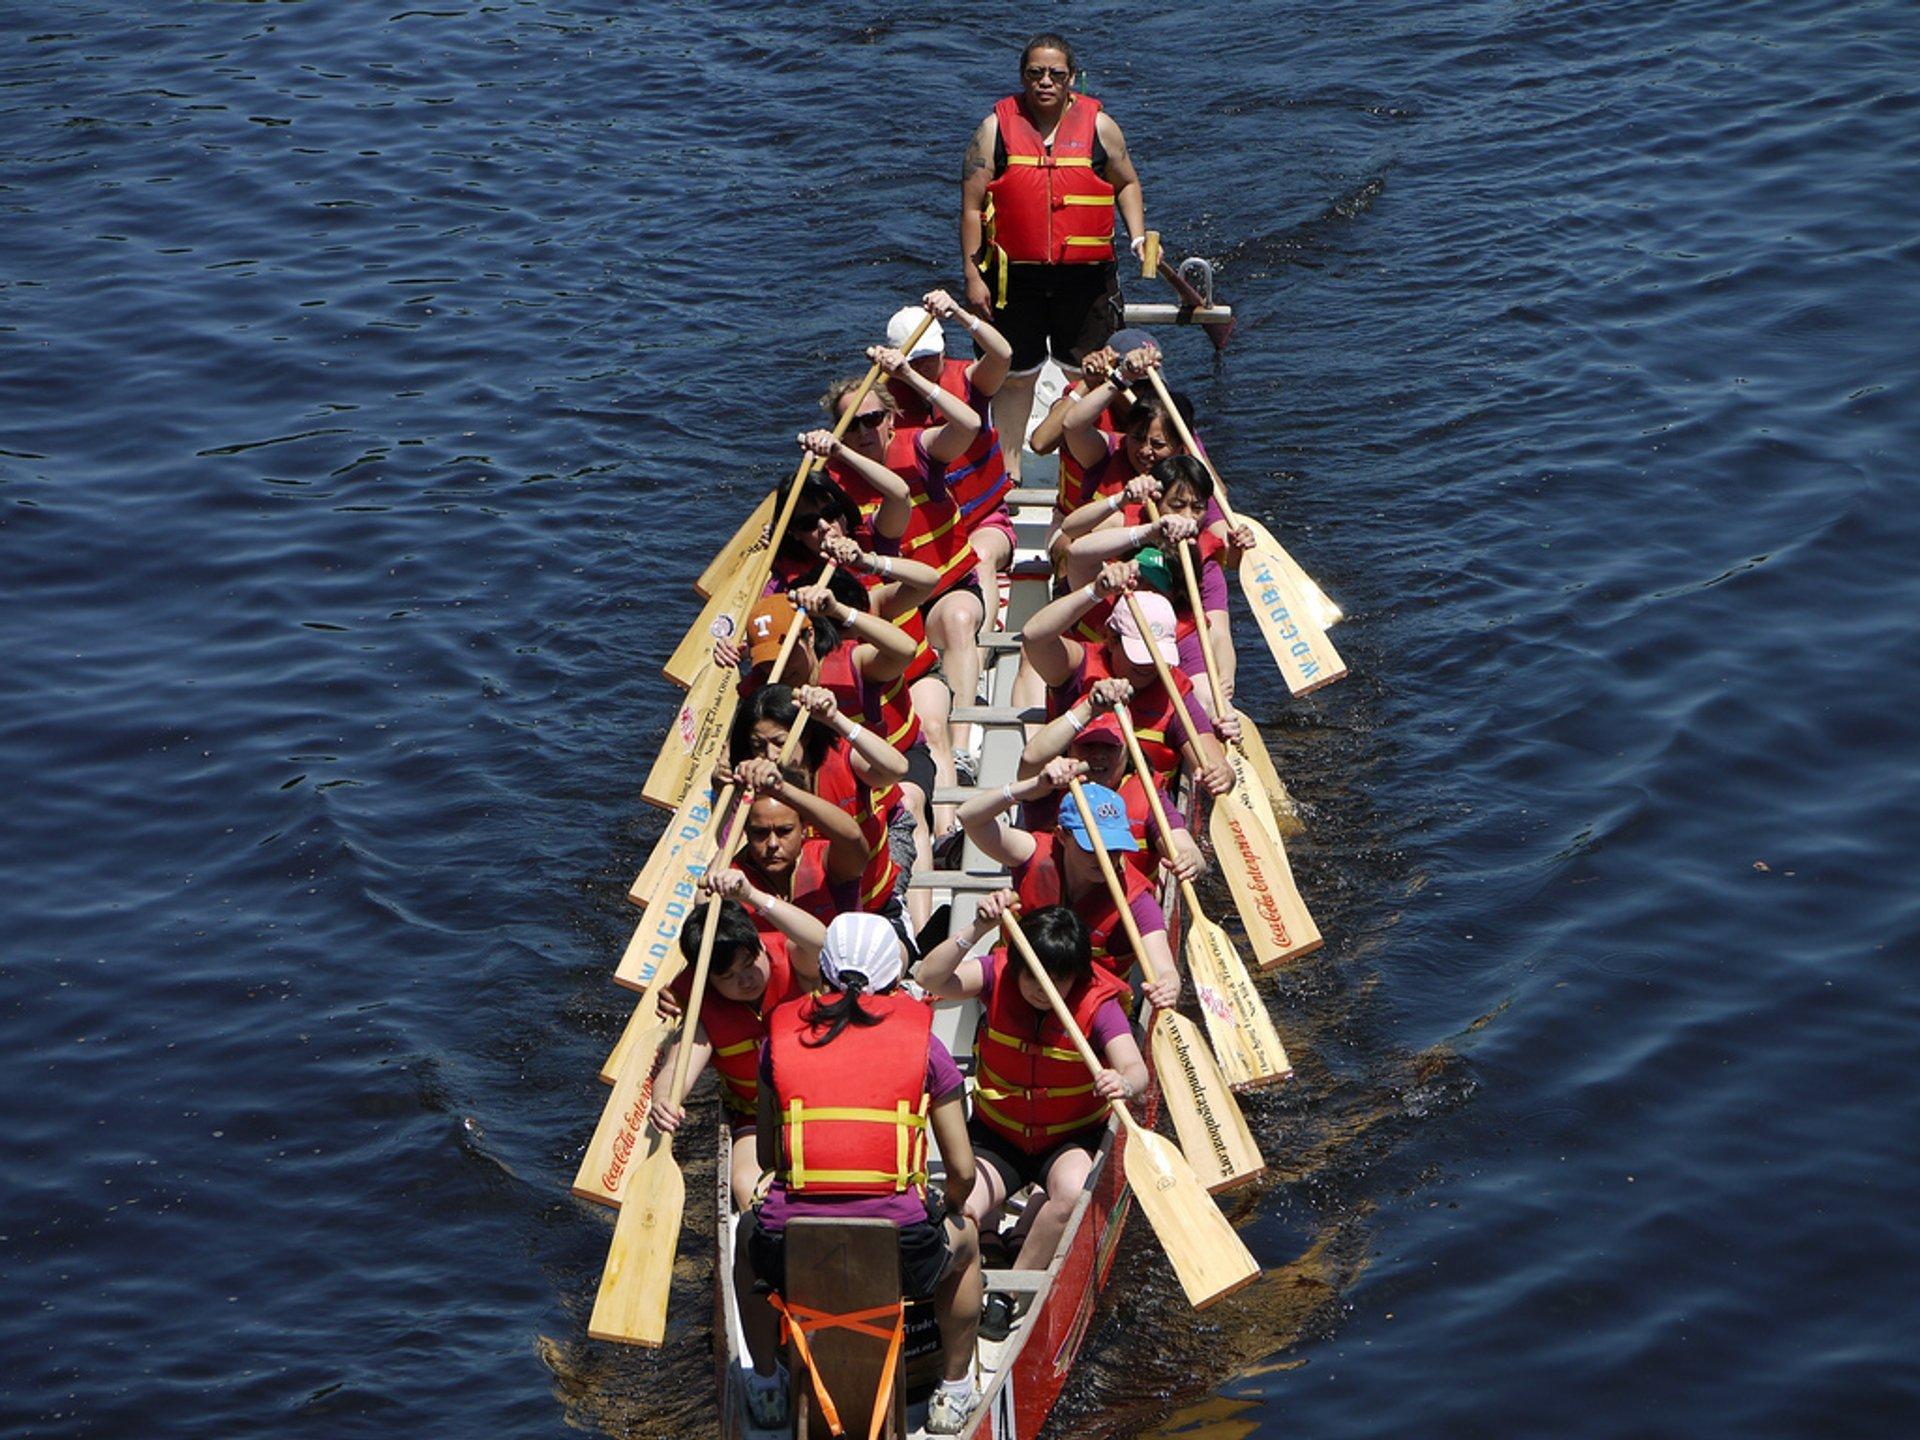 Best time for Boston Dragon Boat Festival in Boston 2019